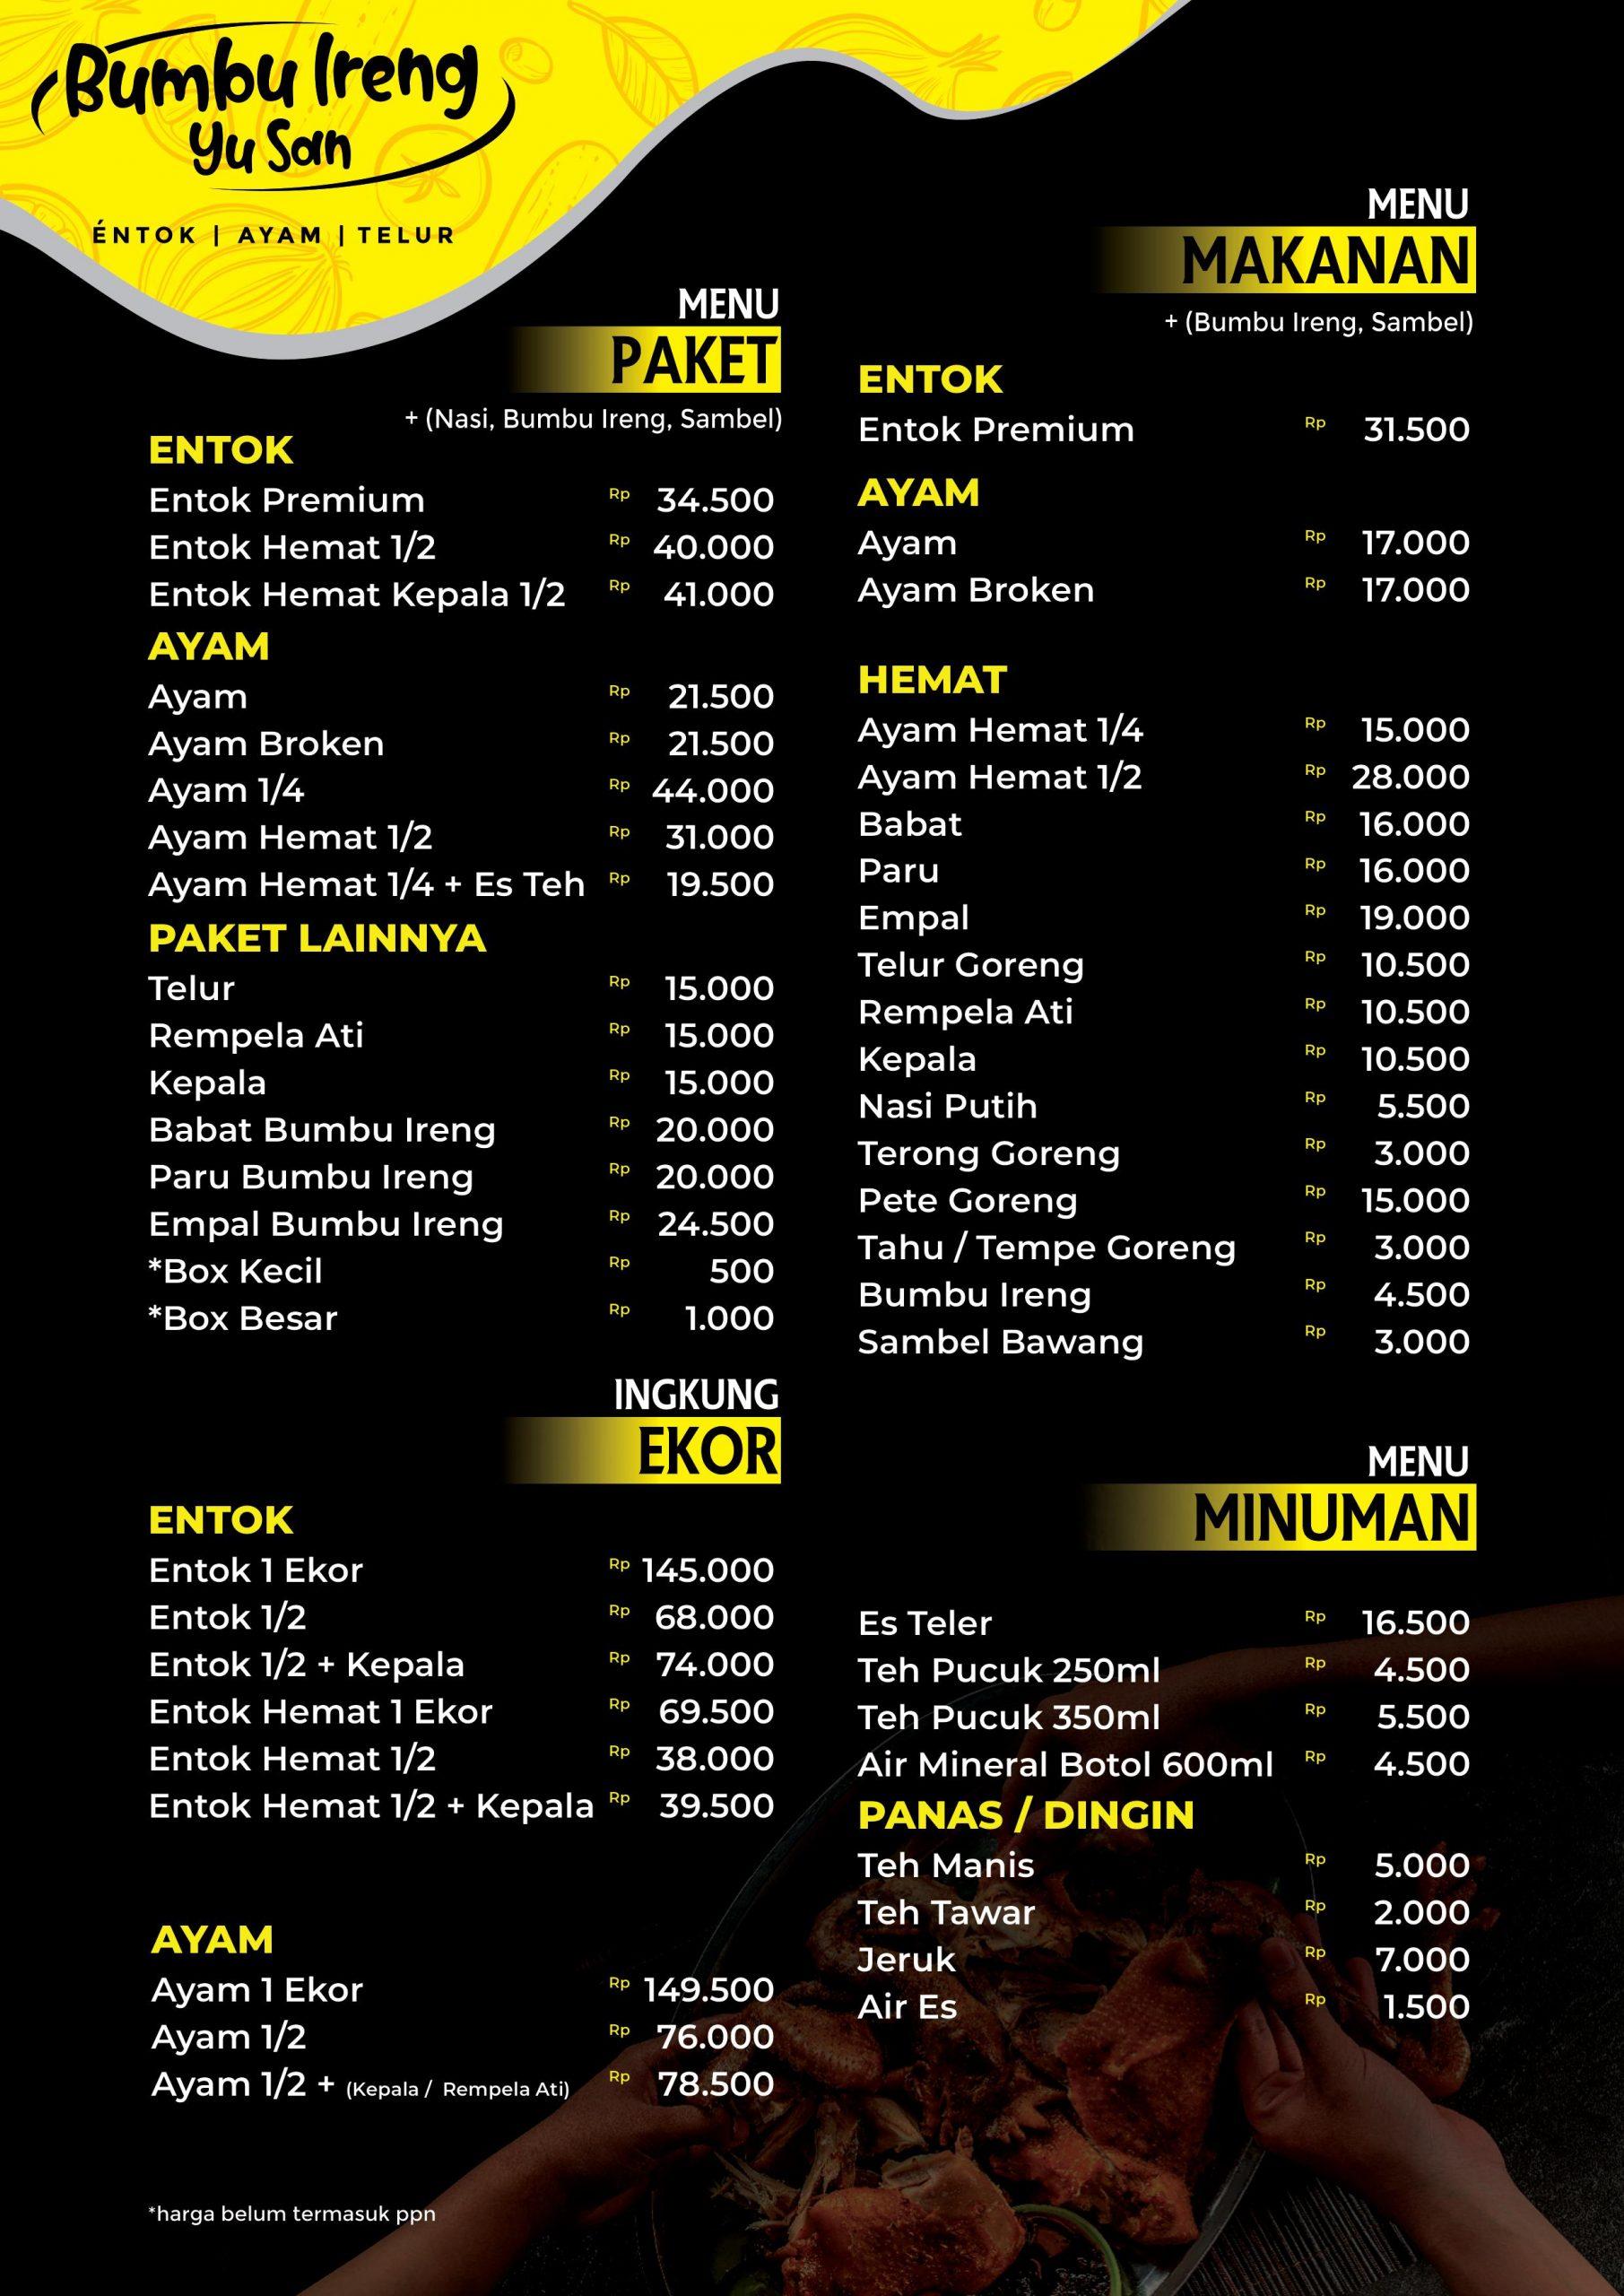 daftar menu bumbu ireng yu san jakarta jatim